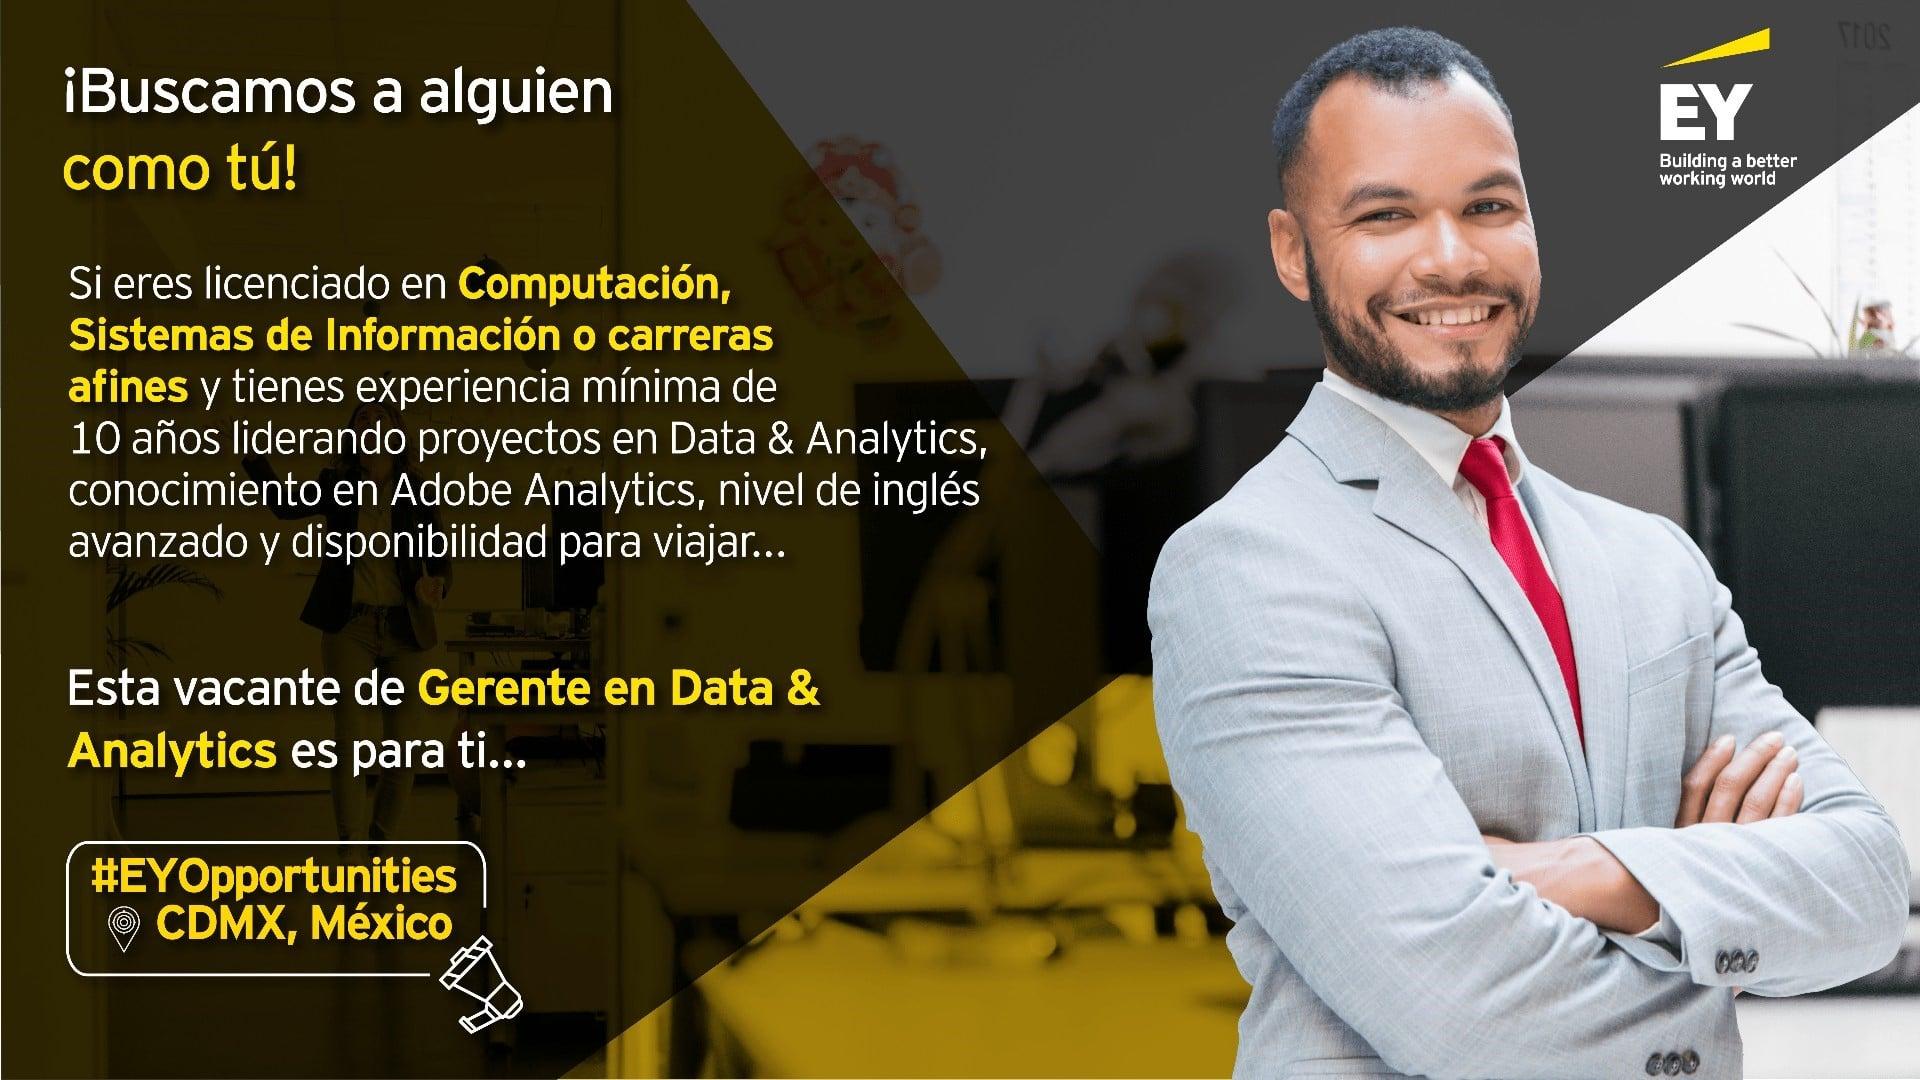 Gerente en Data & Analytics